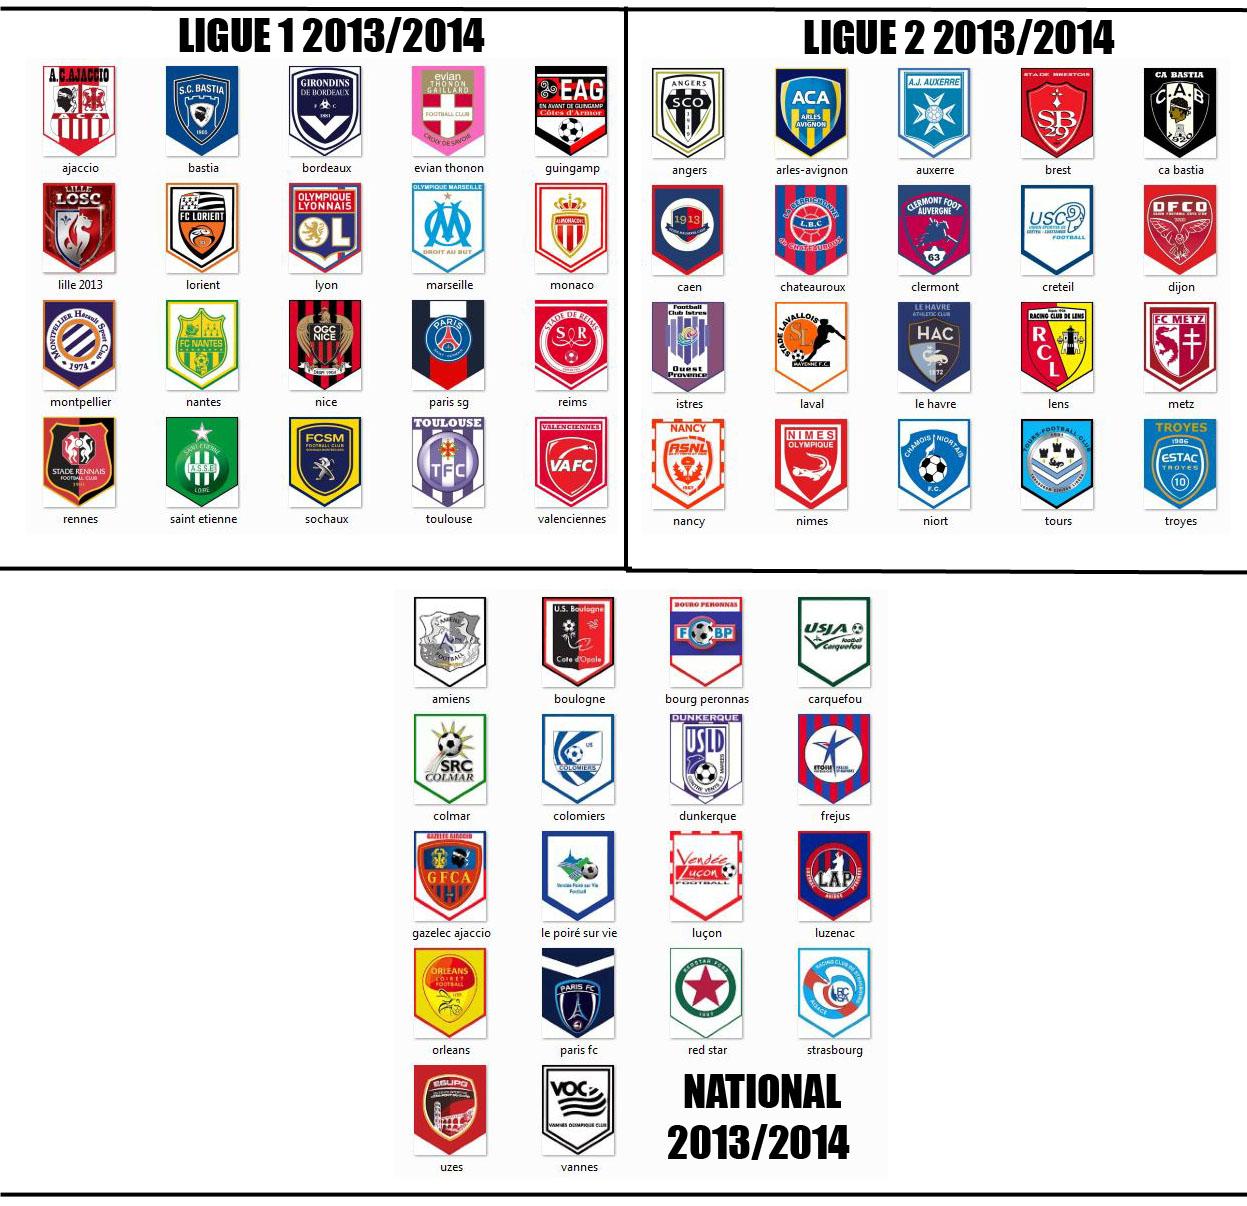 fanions de football: ligue 1-2-3 france 2013-2014 Soccerway